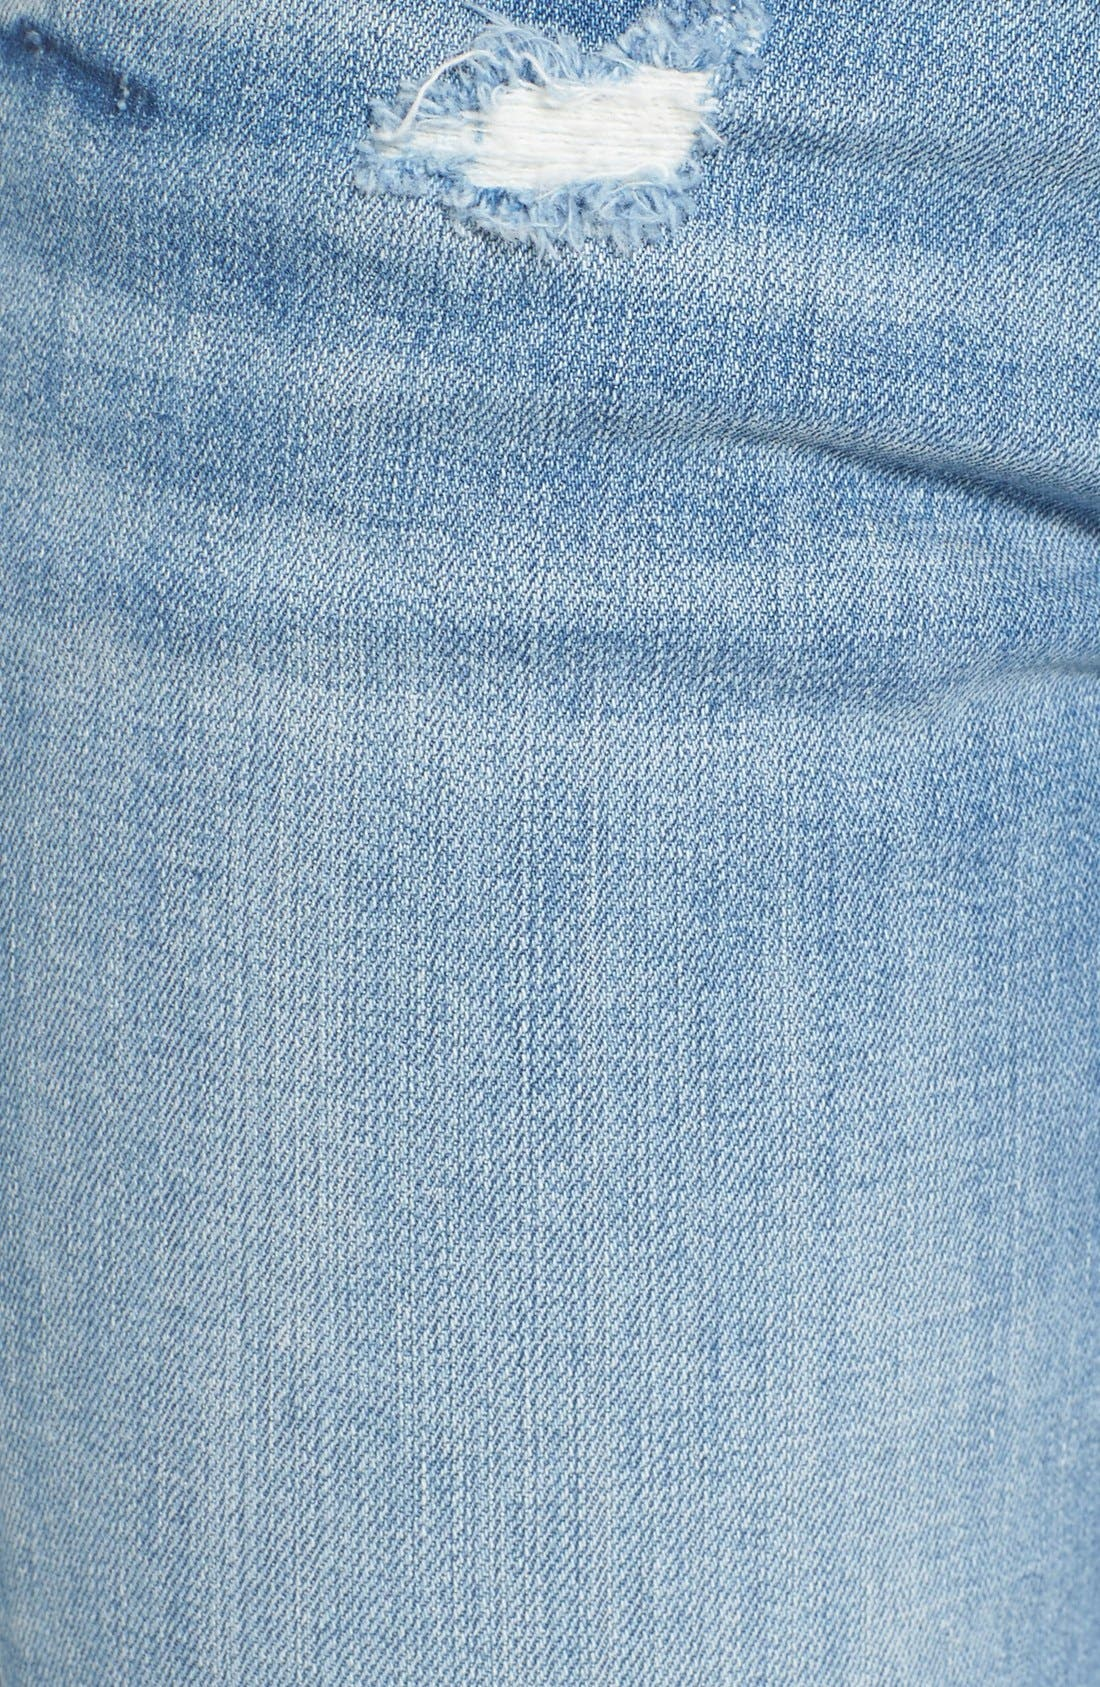 Alternate Image 5  - Vigoss 'Tomboy 'Thompson' Distressed Boyfriend Jeans